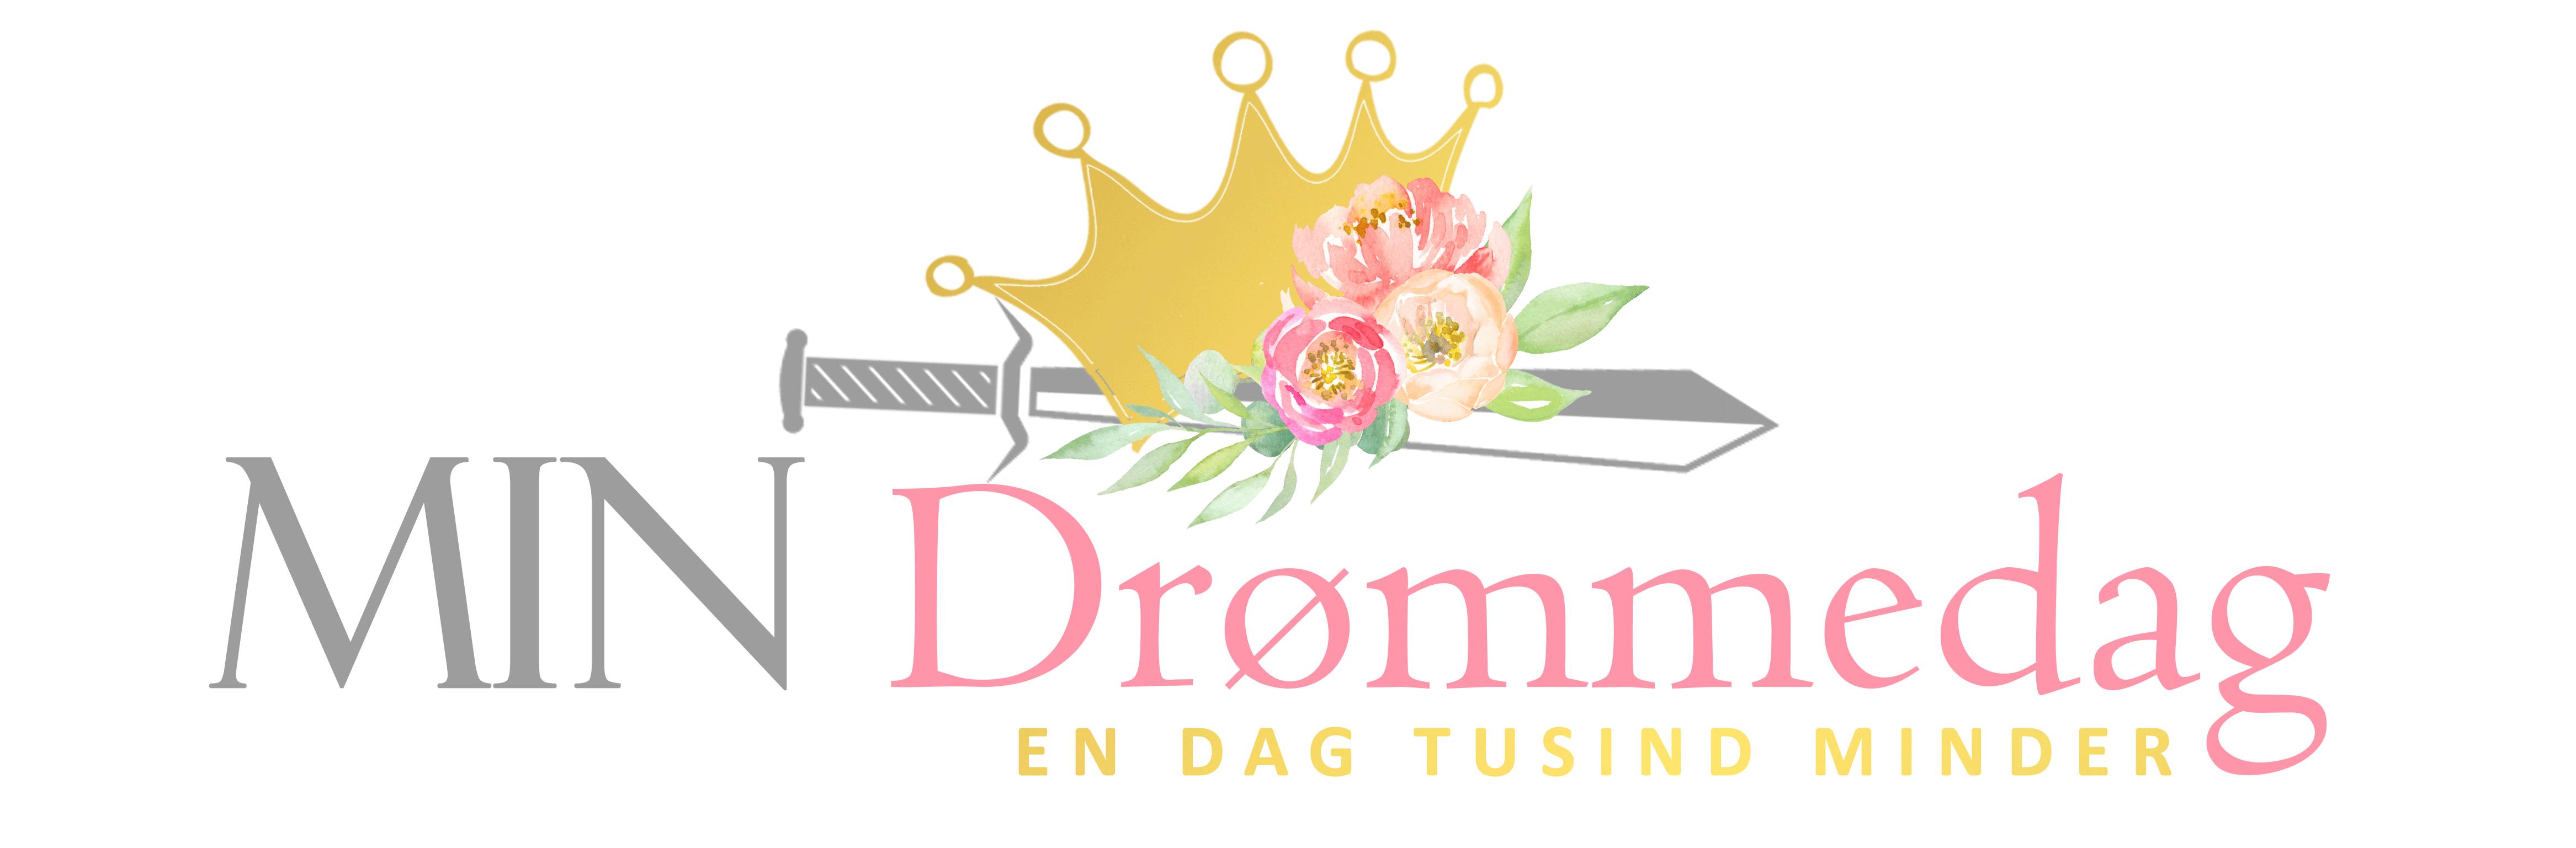 Min Drømmedag logo